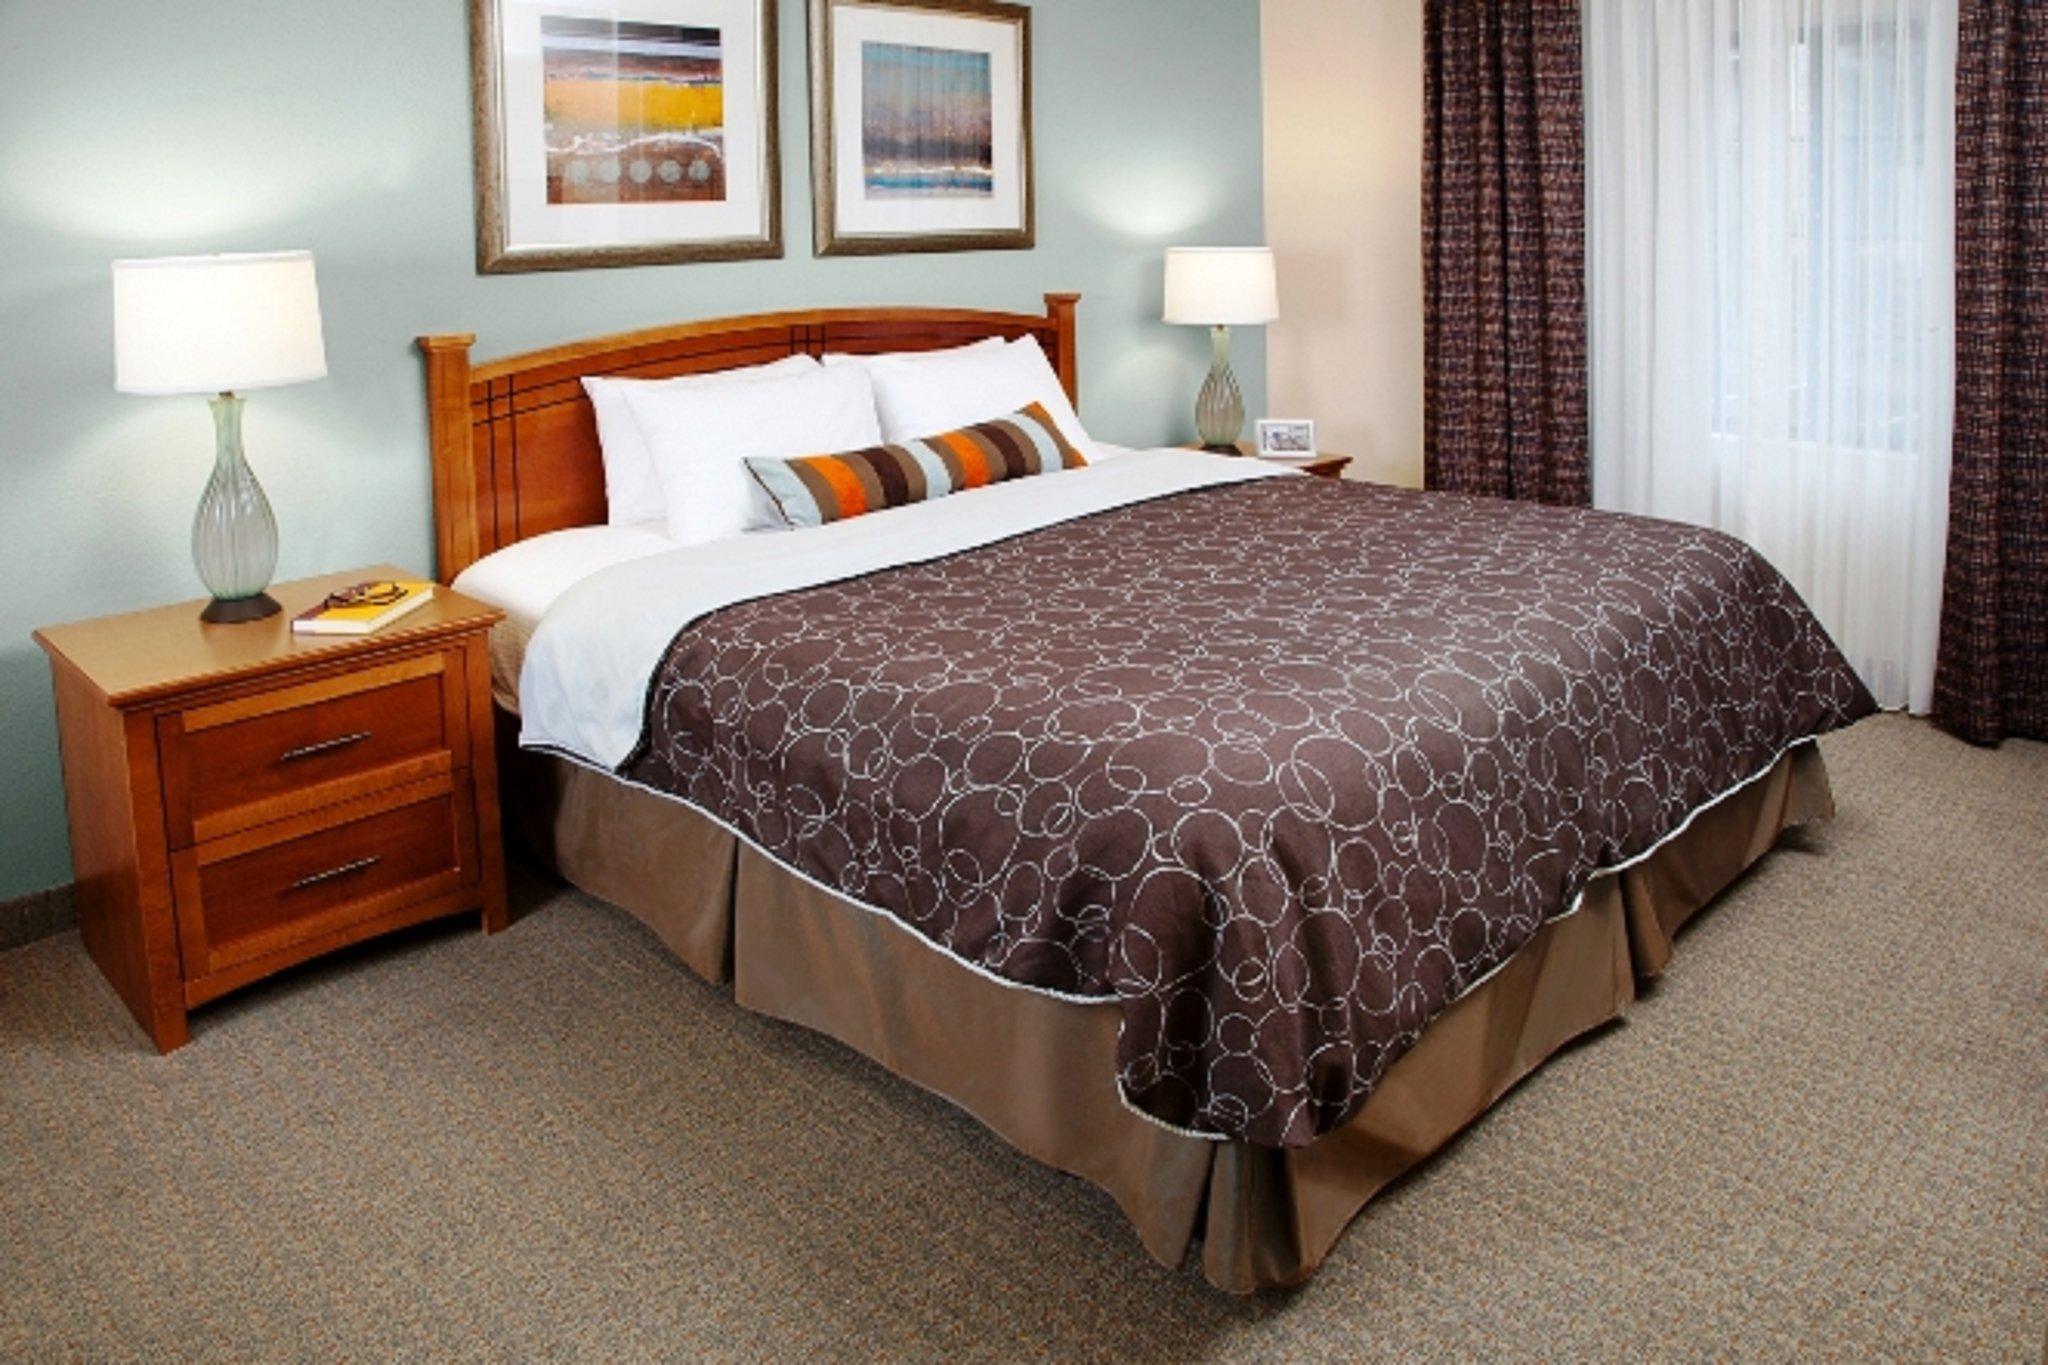 Staybridge Suites Denver South - Park Meadows, Lone Tree ...